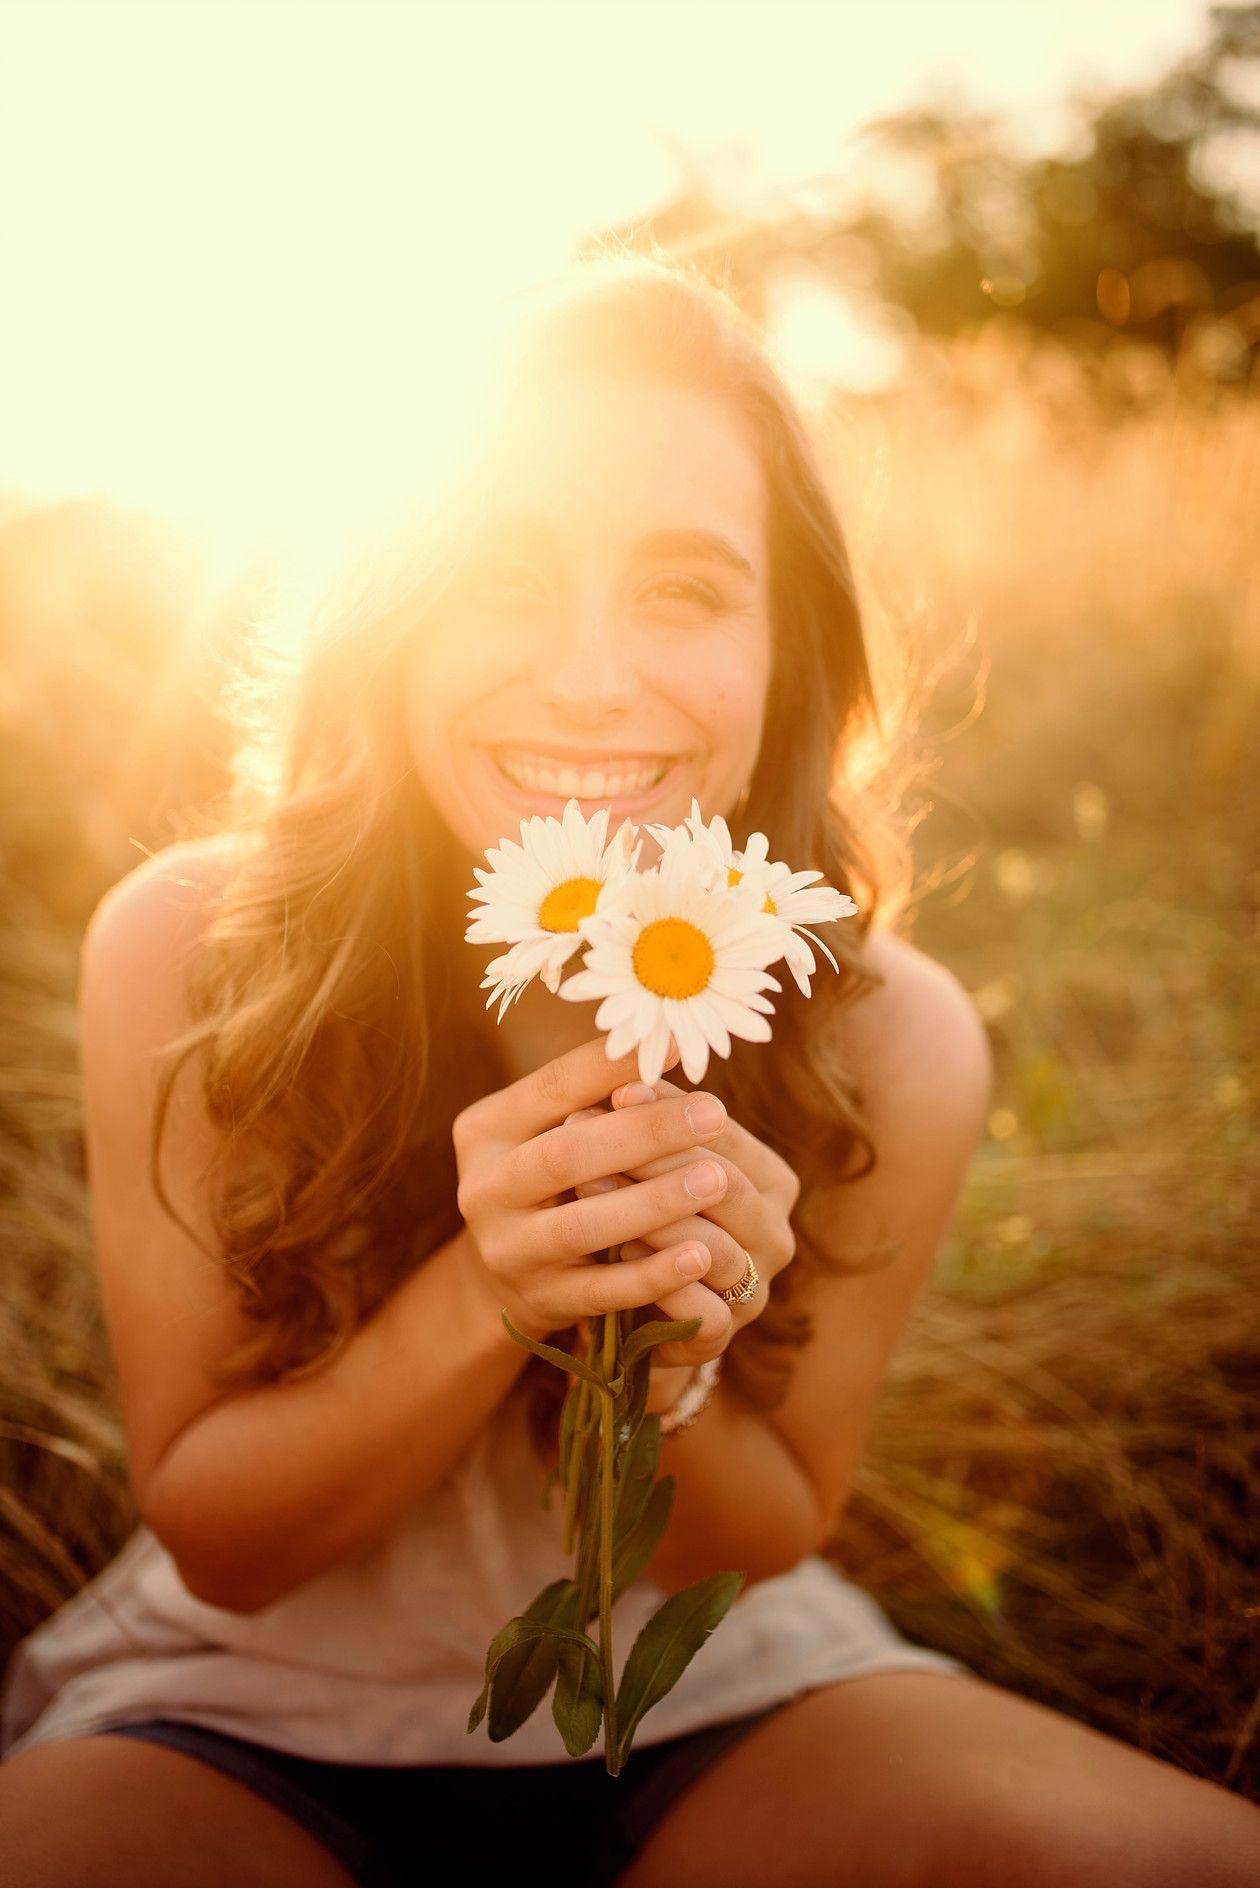 Cute Senior Photoshoot Ideas For Girls